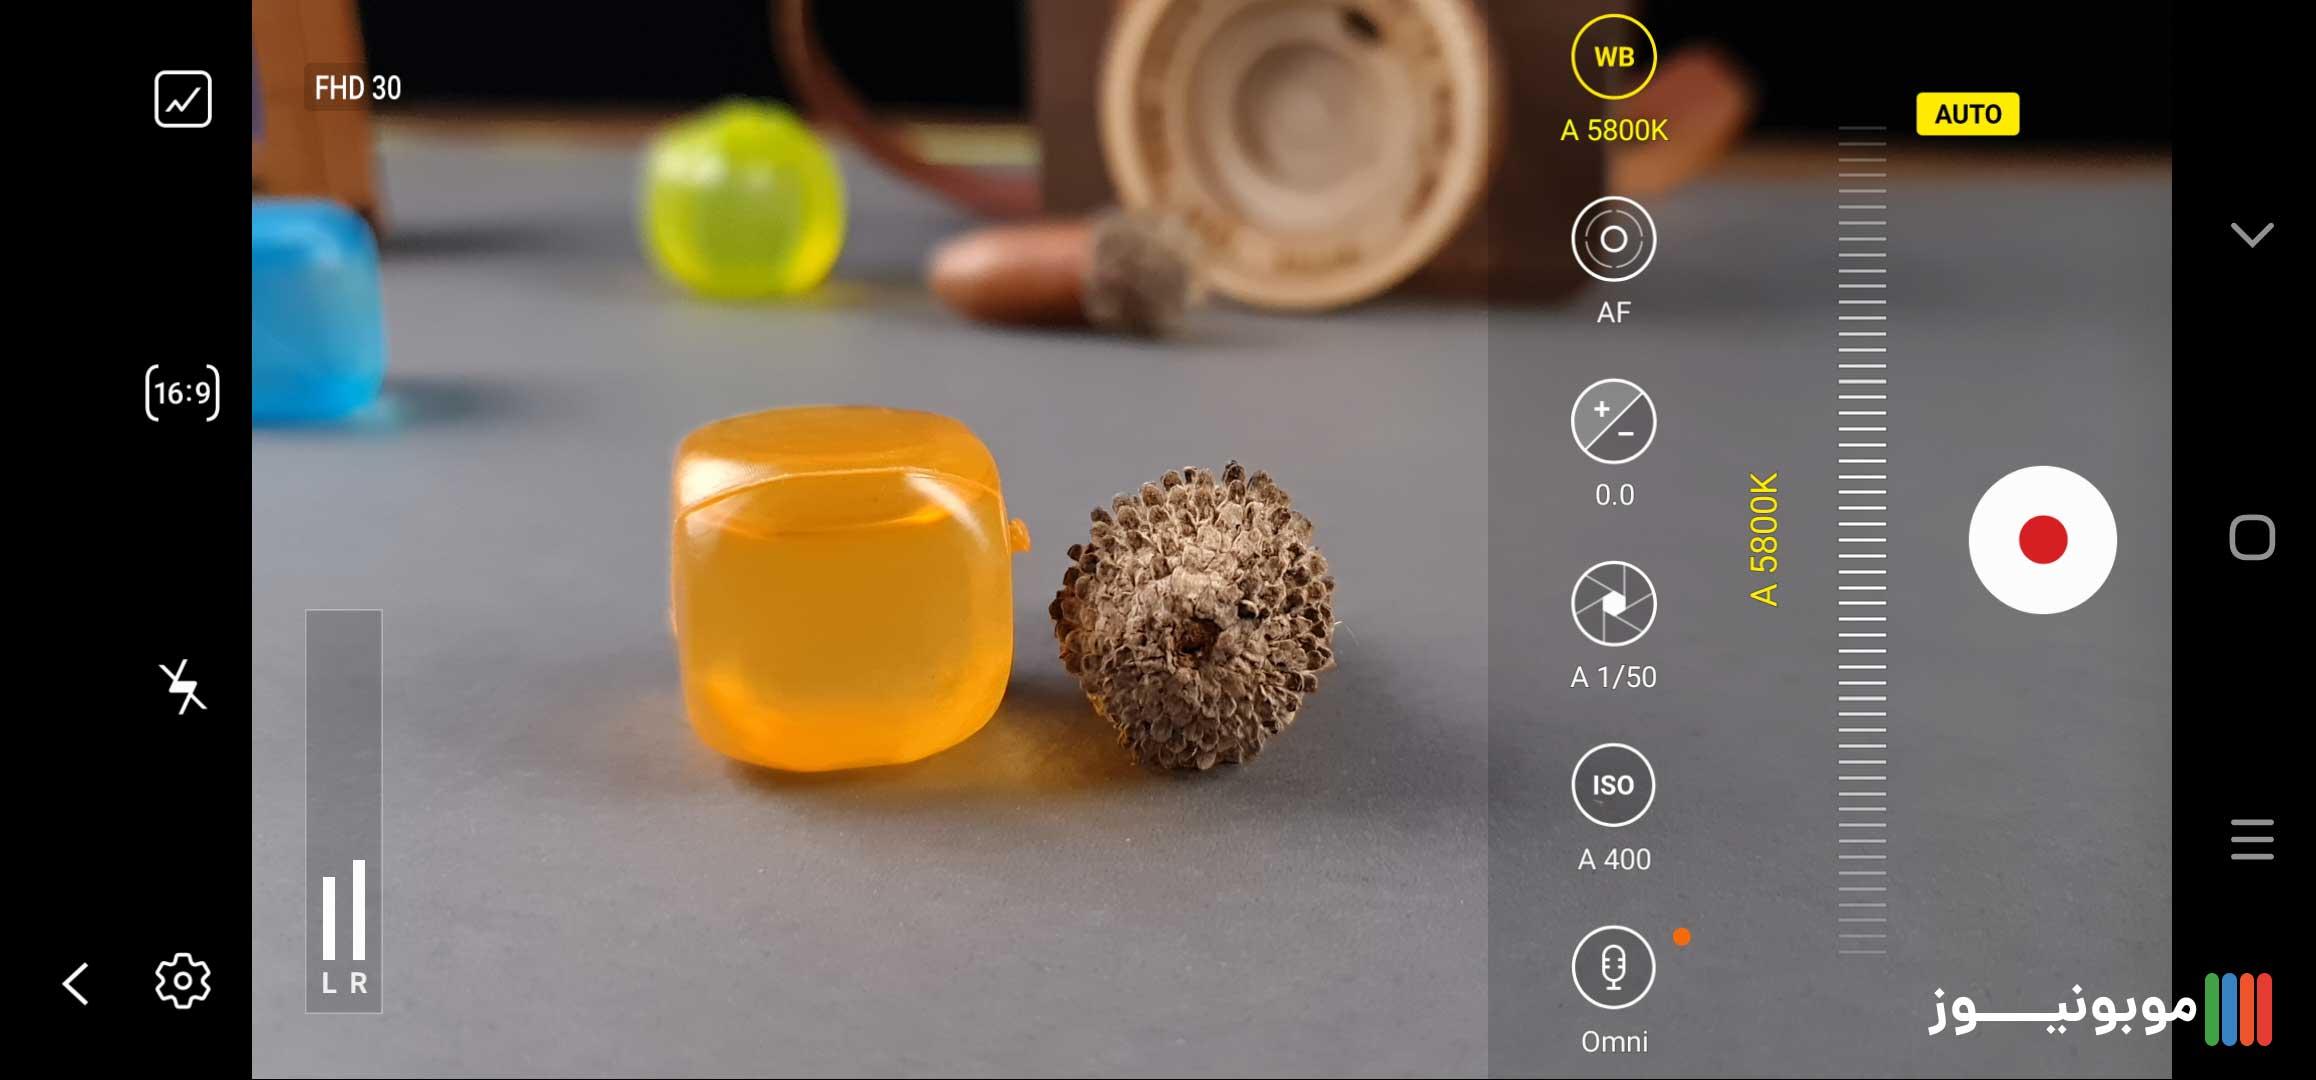 ویژگی های ویدیو Galaxy Note 20 Ultra